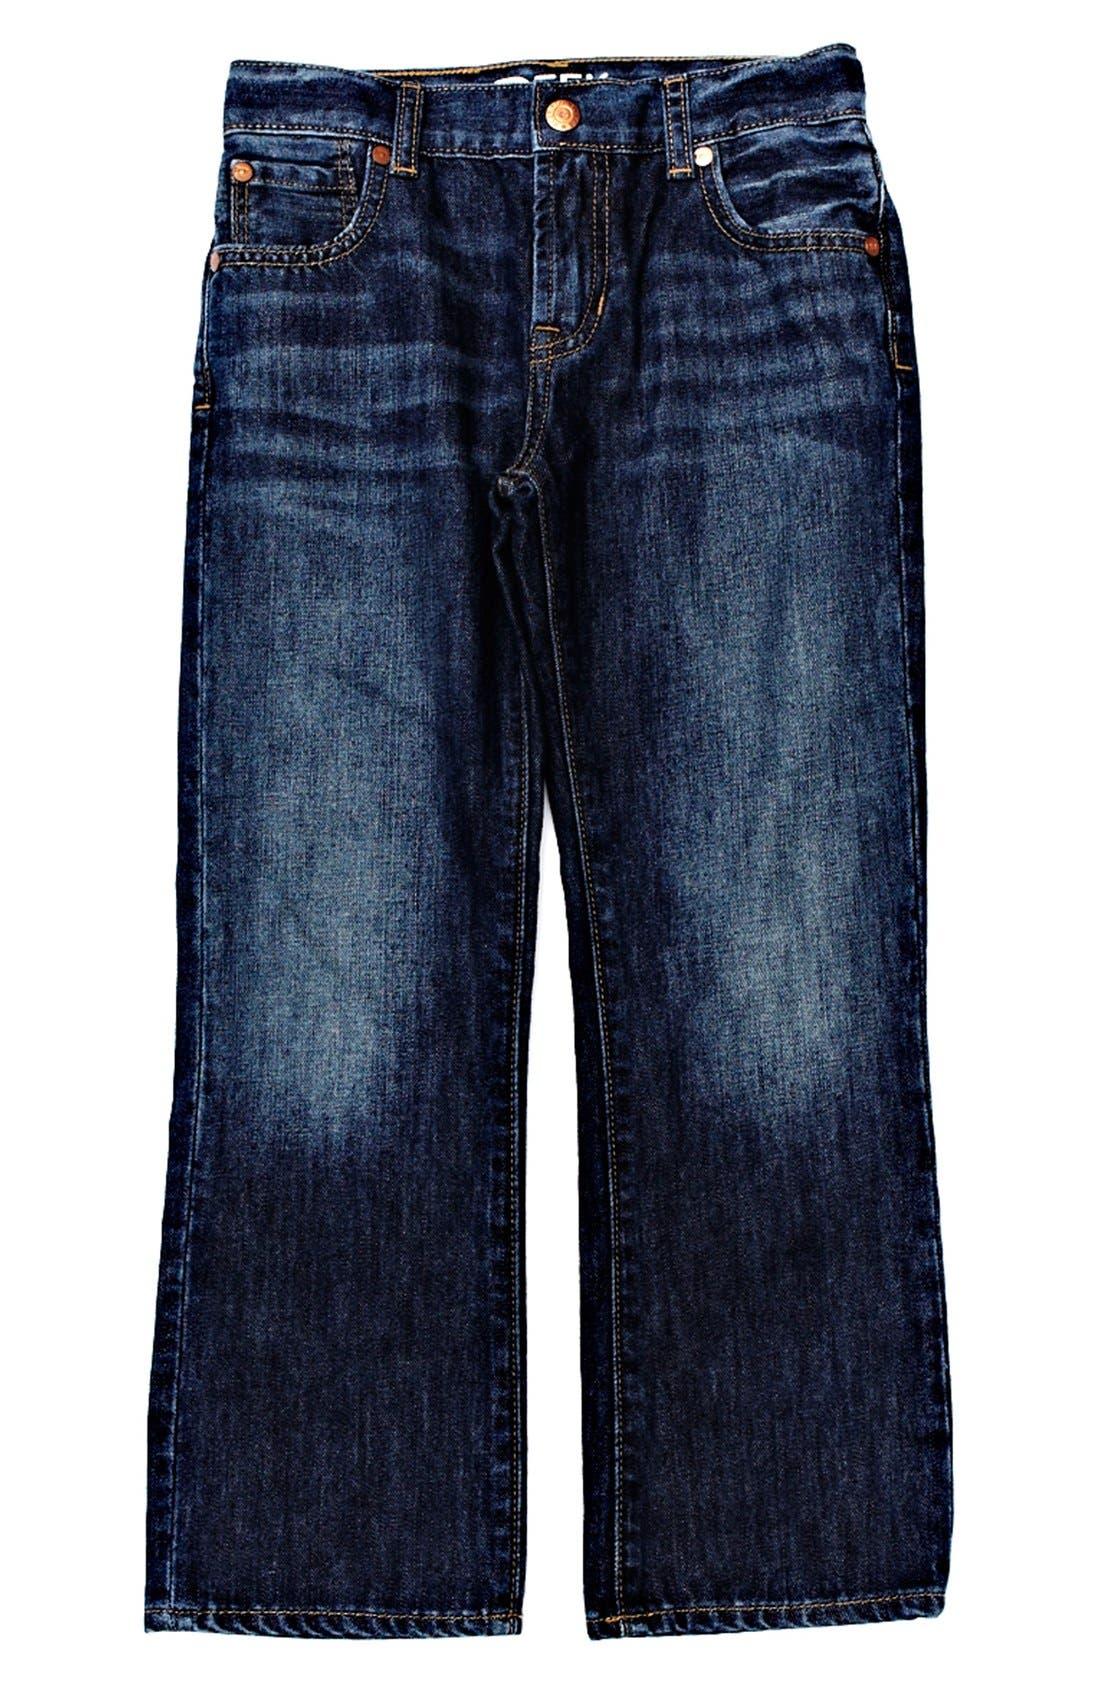 Alternate Image 2  - Peek 'Sullivan' Jeans (Toddler Boys, Little Boys & Big Boys)